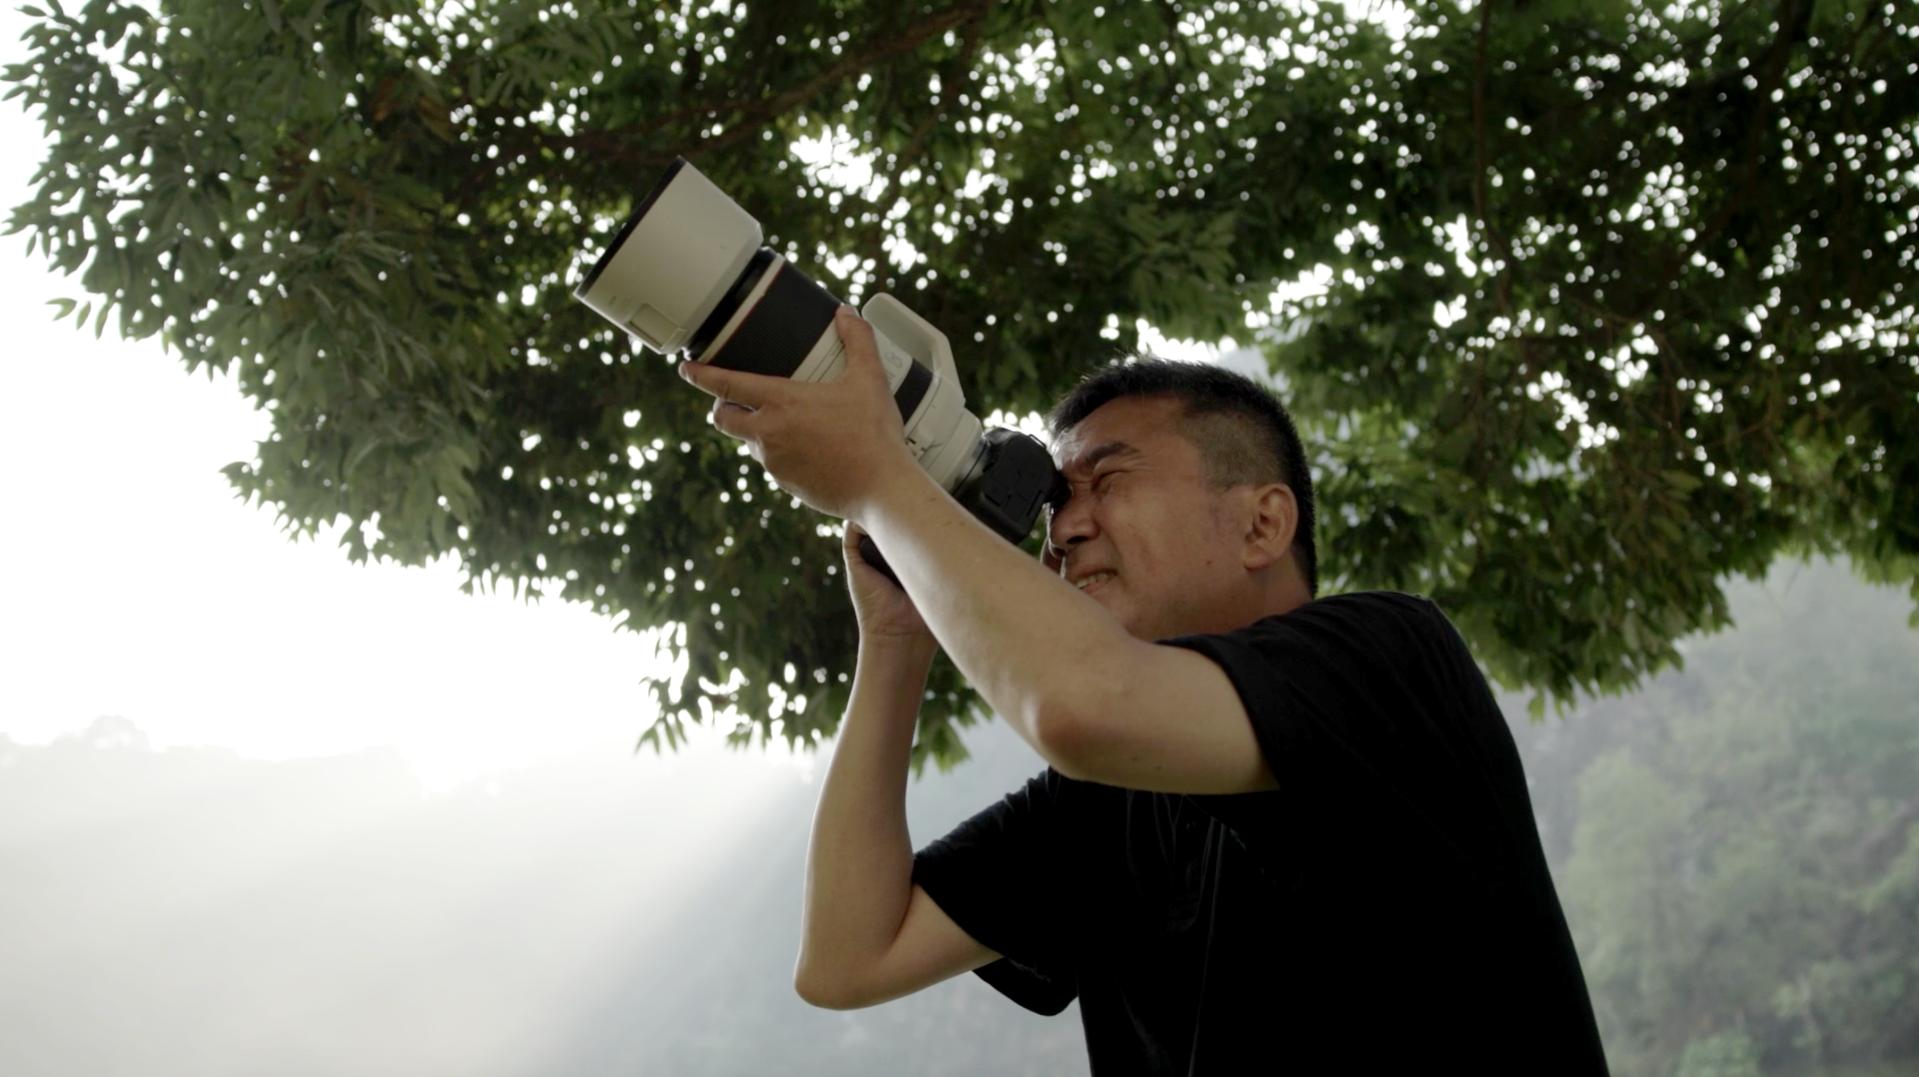 Canon Photographer William Tan using Canon EOS R6